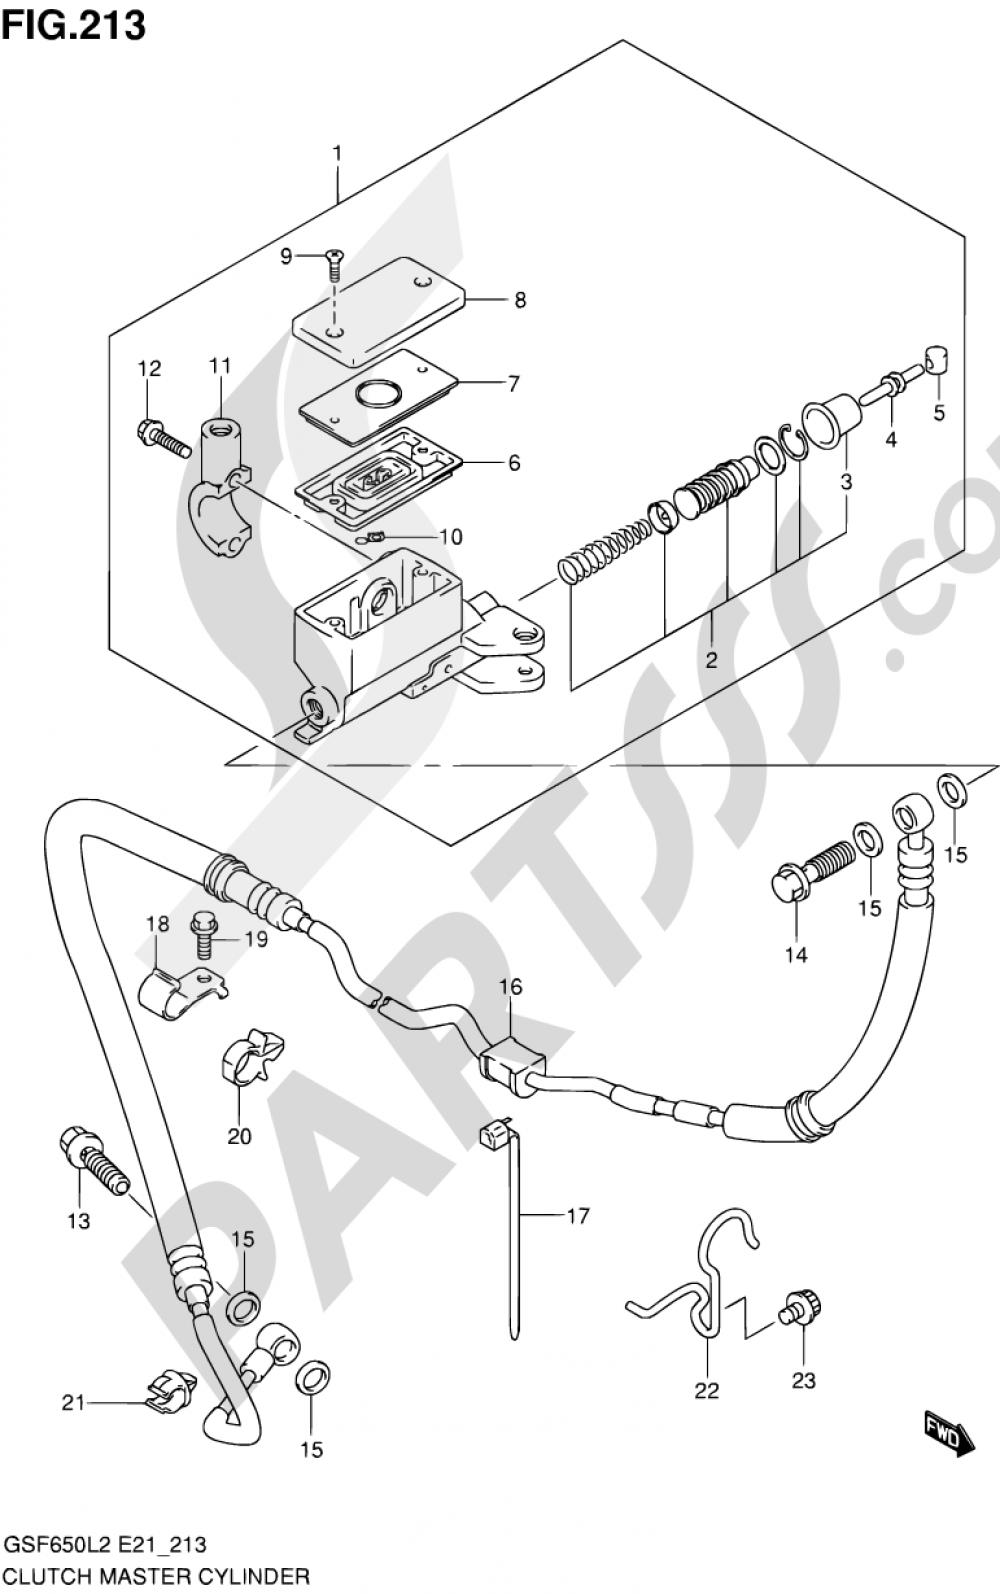 213 - CLUTCH MASTER CYLINDER (GSF650L2 E21) Suzuki BANDIT GSF650SA 2012